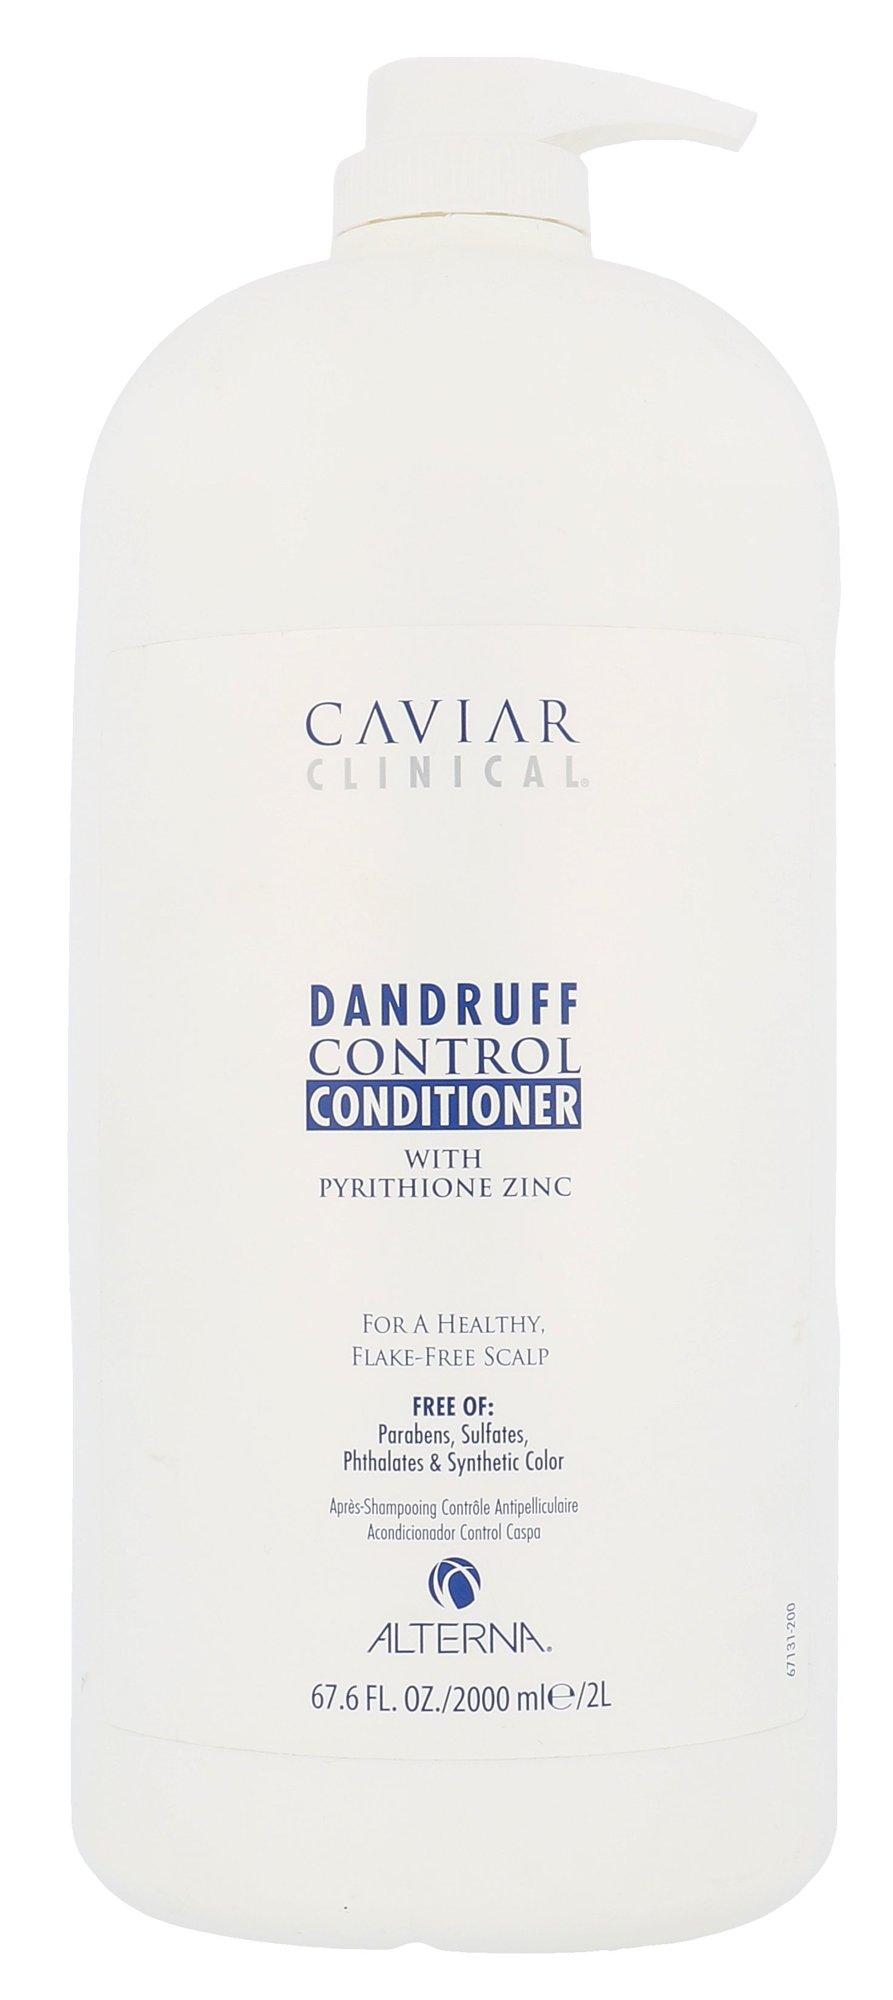 Alterna Caviar Clinical Cosmetic 2000ml  Dandruff Control